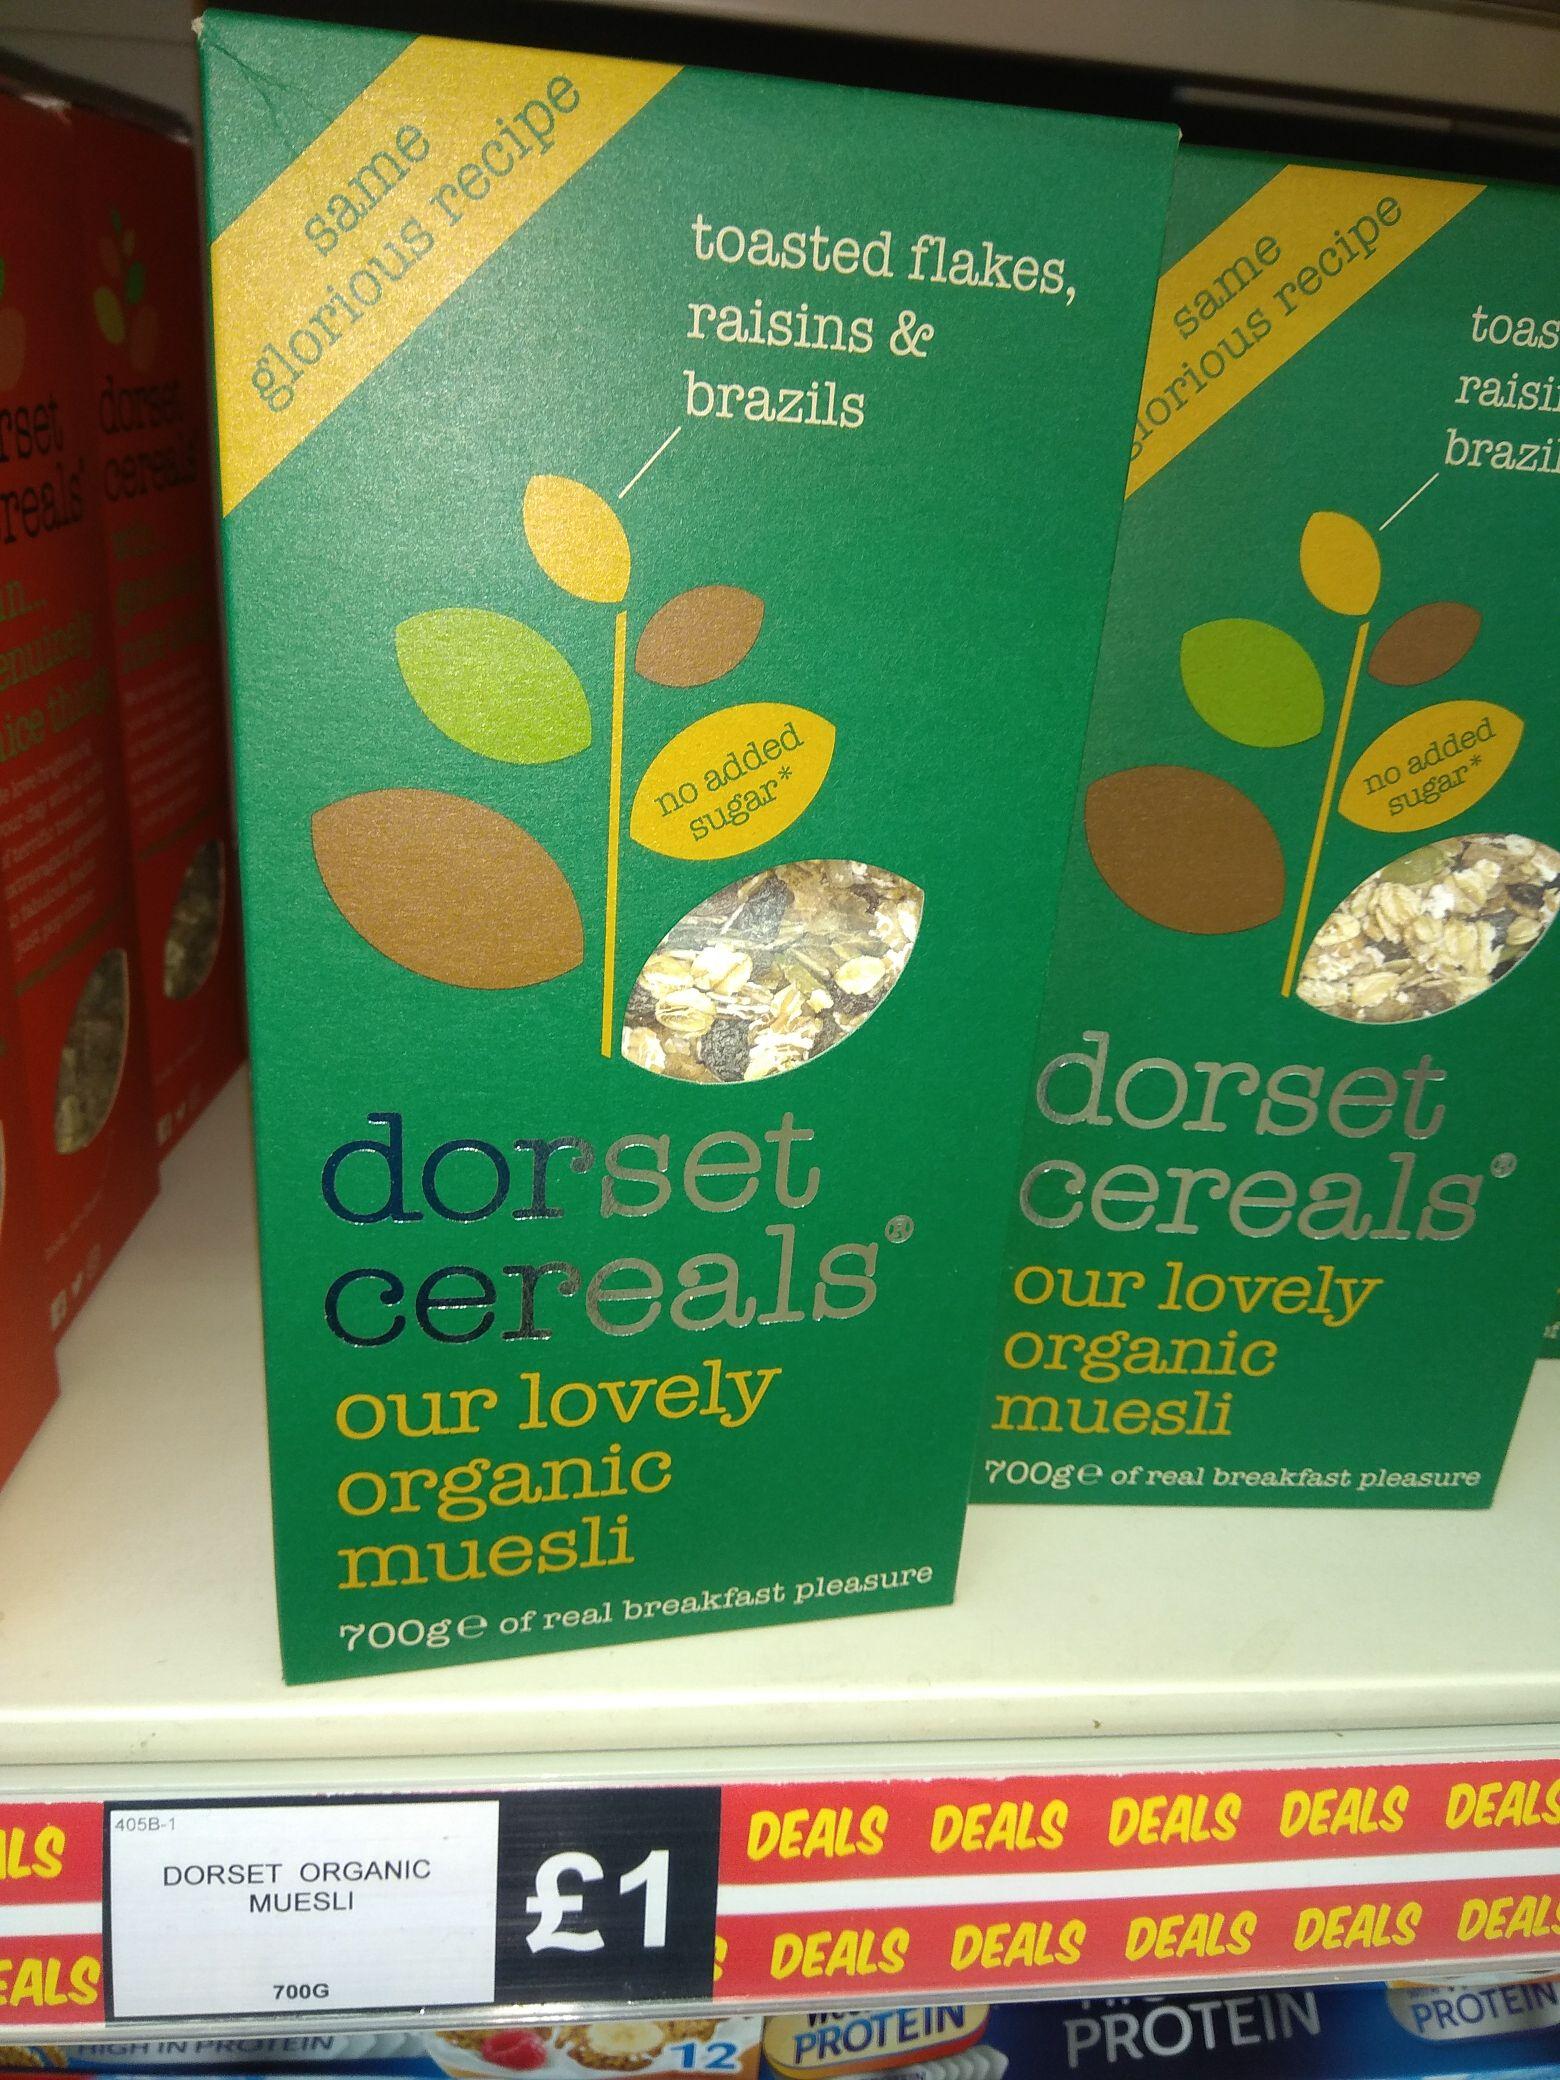 Dorset Cereals Organic Muesli (no added sugar) 700g - £1 @ Fulton Foods